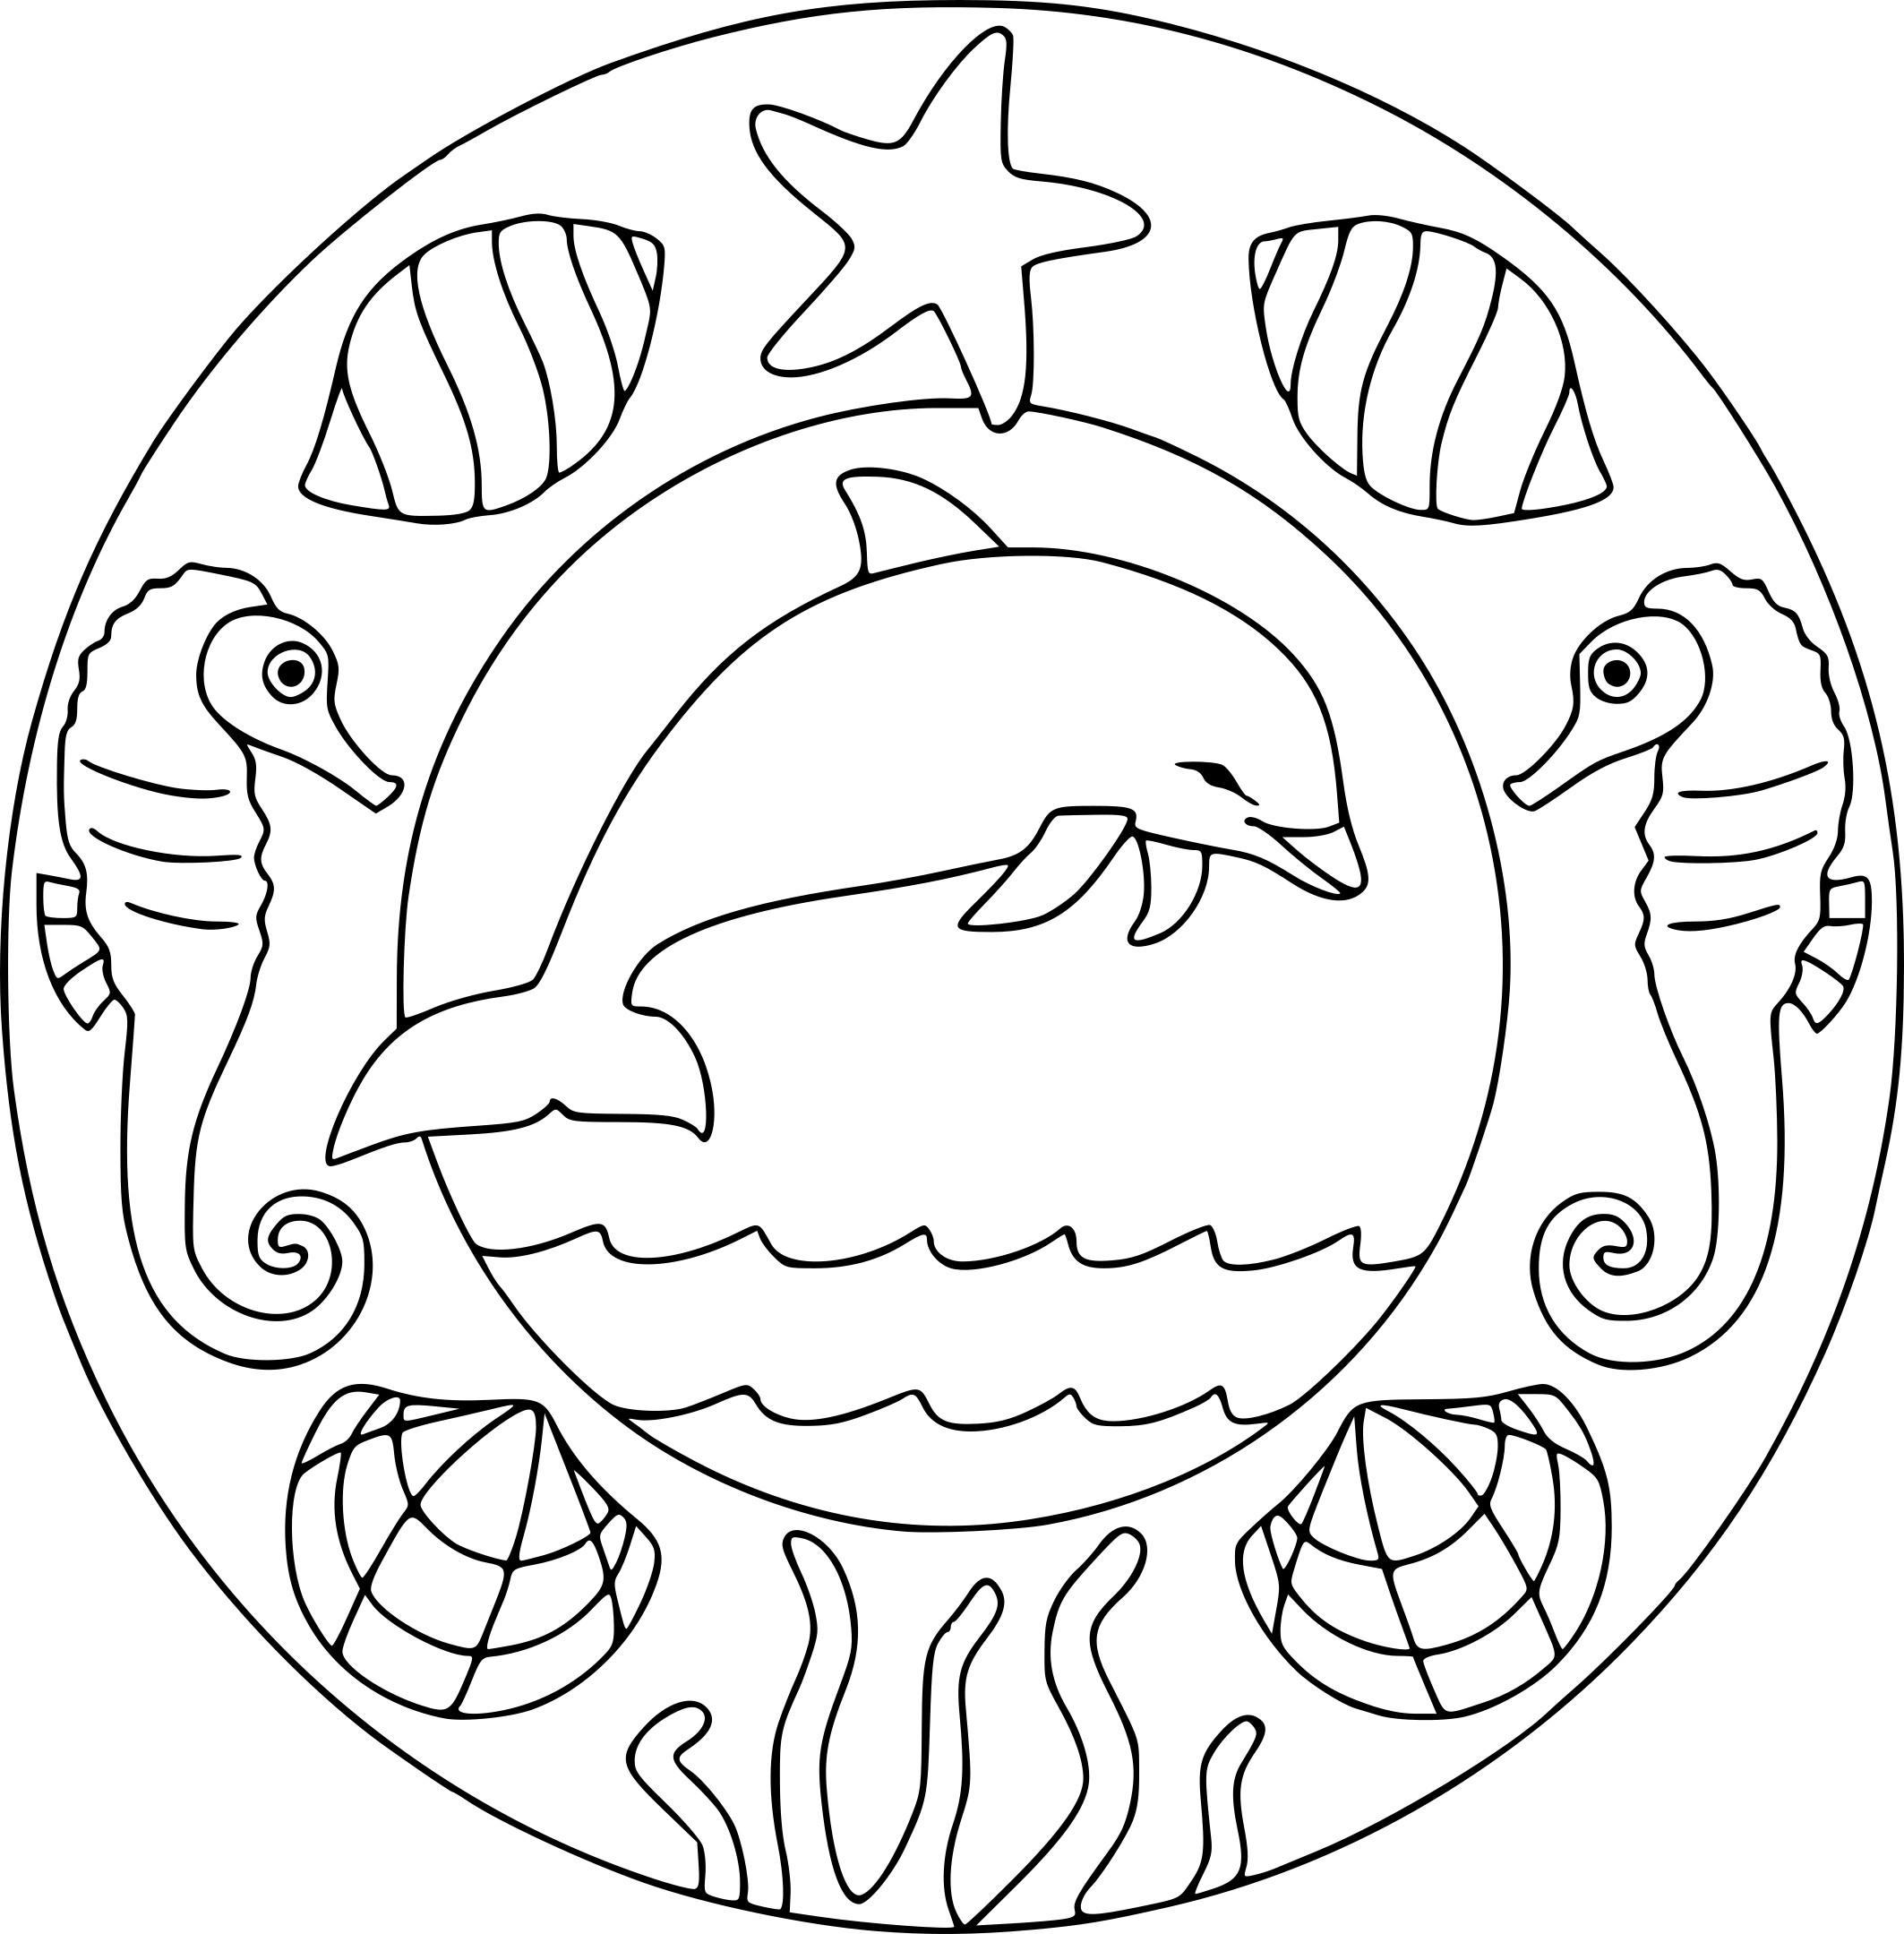 Coloriage Dauphin Mandala Dessin À Imprimer Sur Coloriages pour Dessin De Dauphin À Colorier